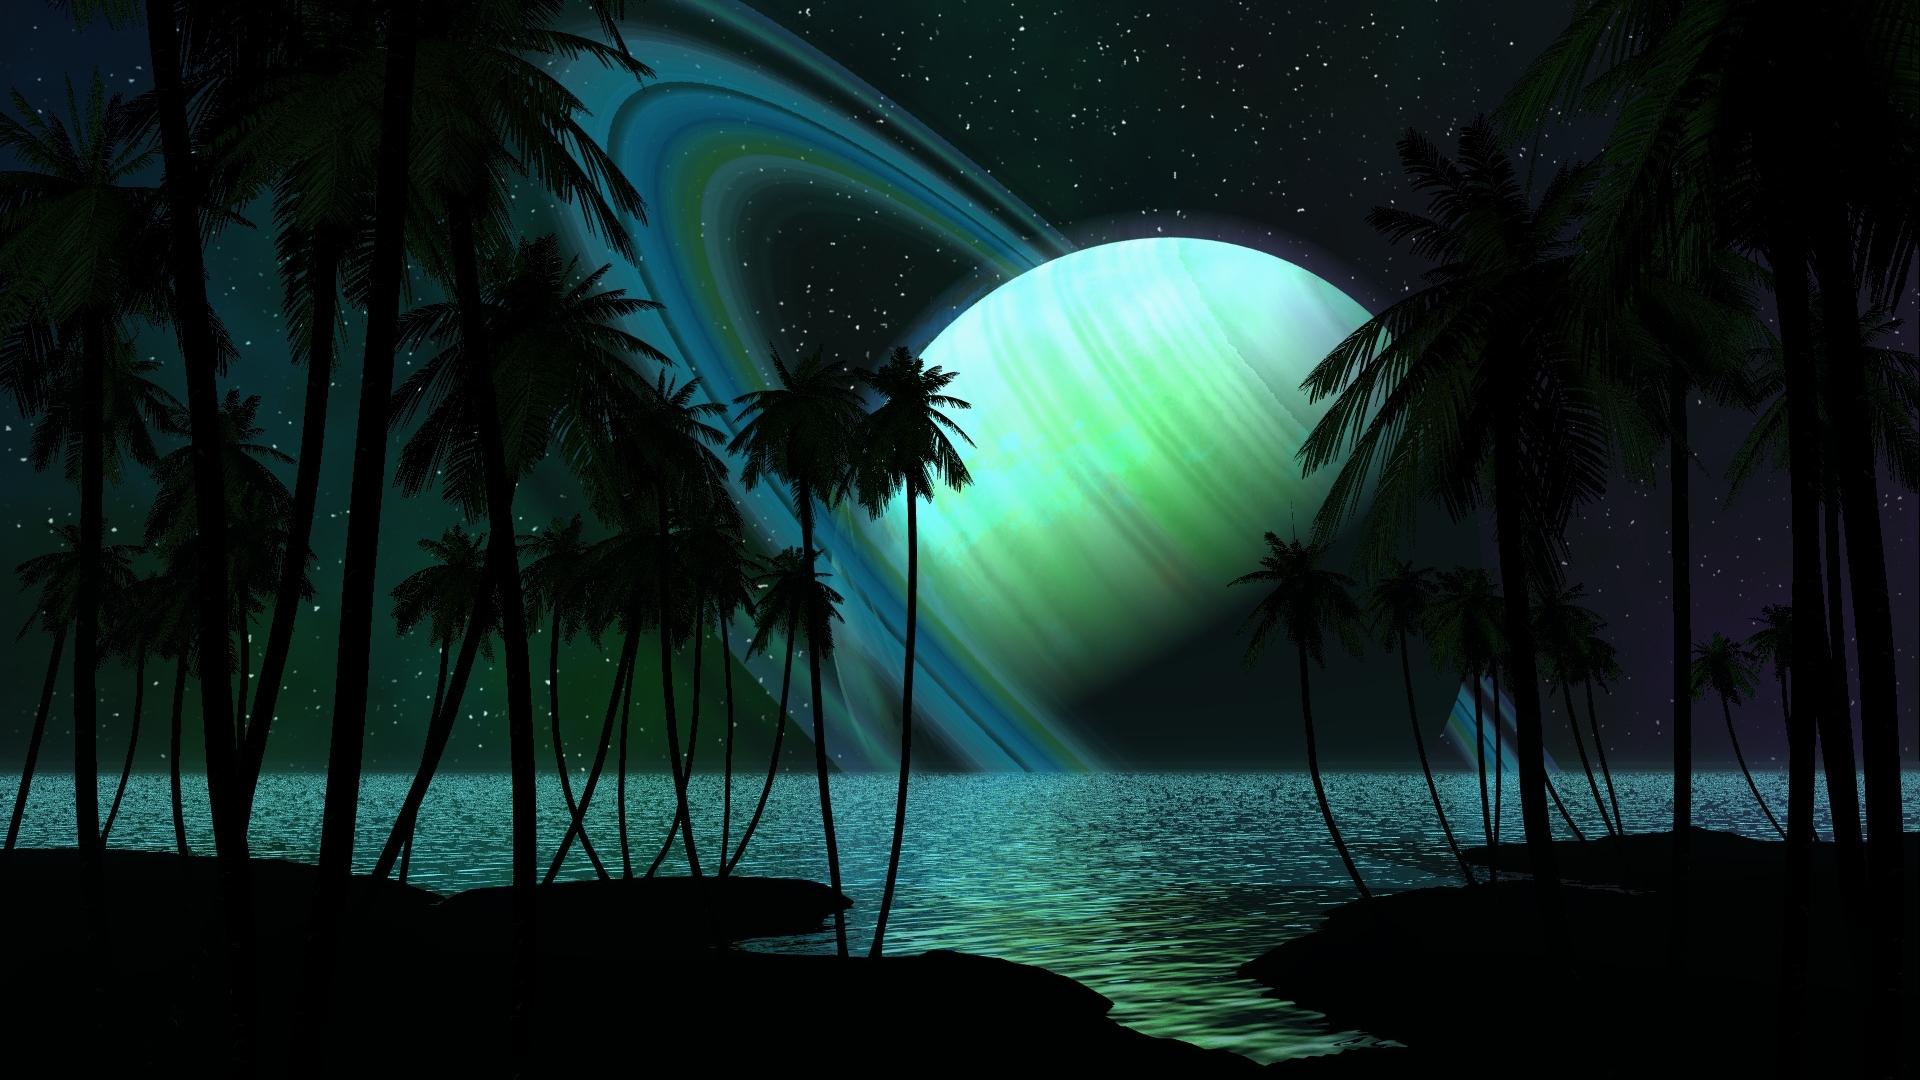 Wallpaper Saturn Planet Palm Trees Sky Light 1920x1080